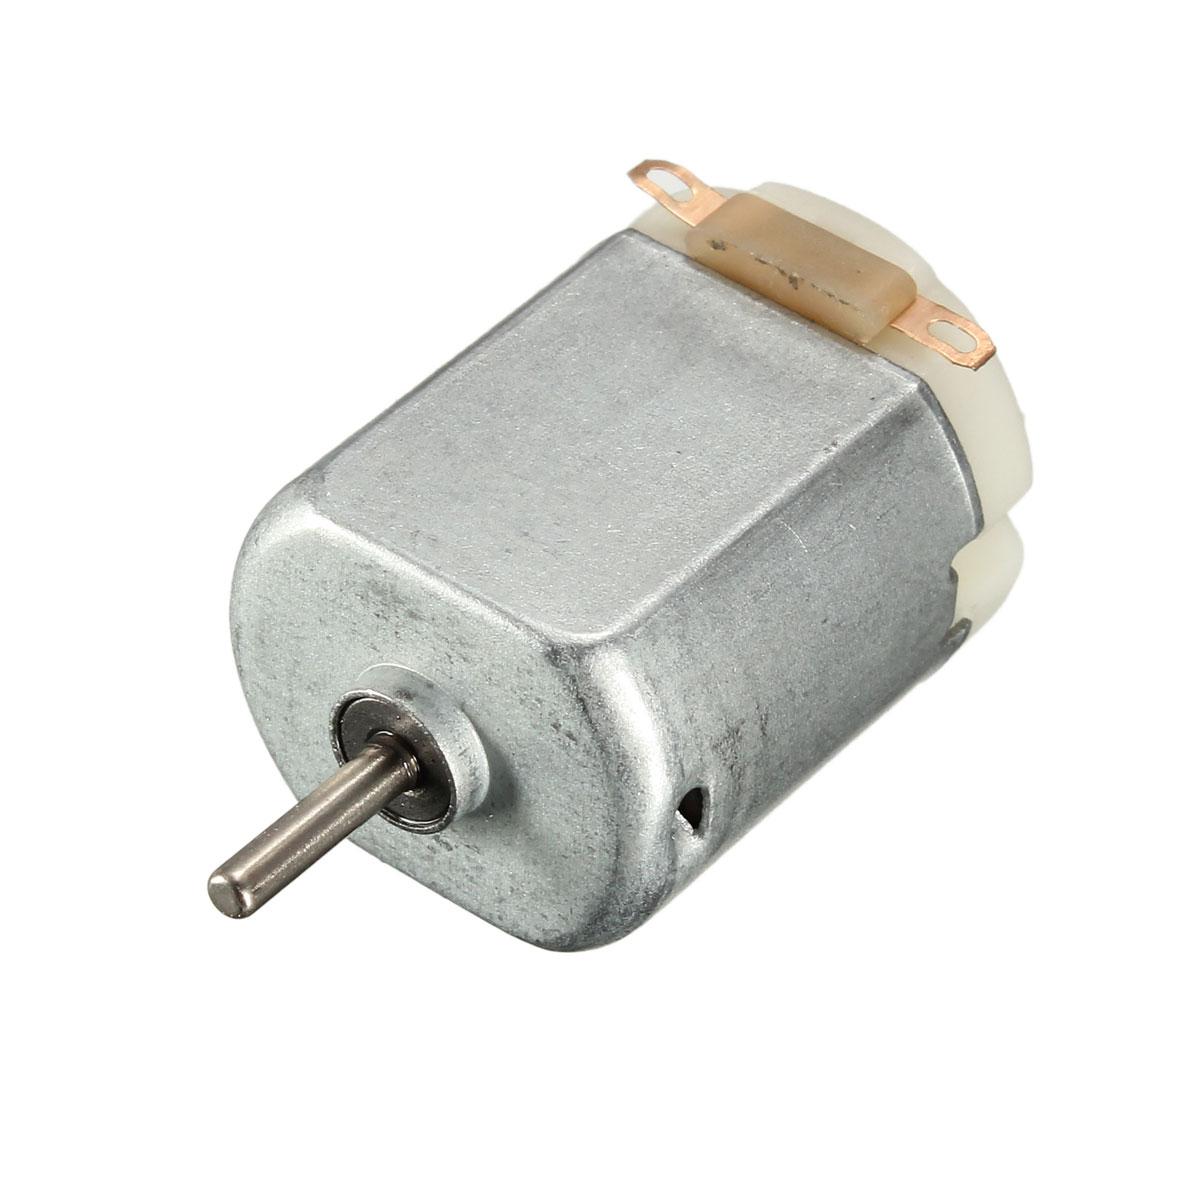 10Pcs/Pack DC 3V Mini Motor For Arduino Smart Robot Car/Model Toy Car